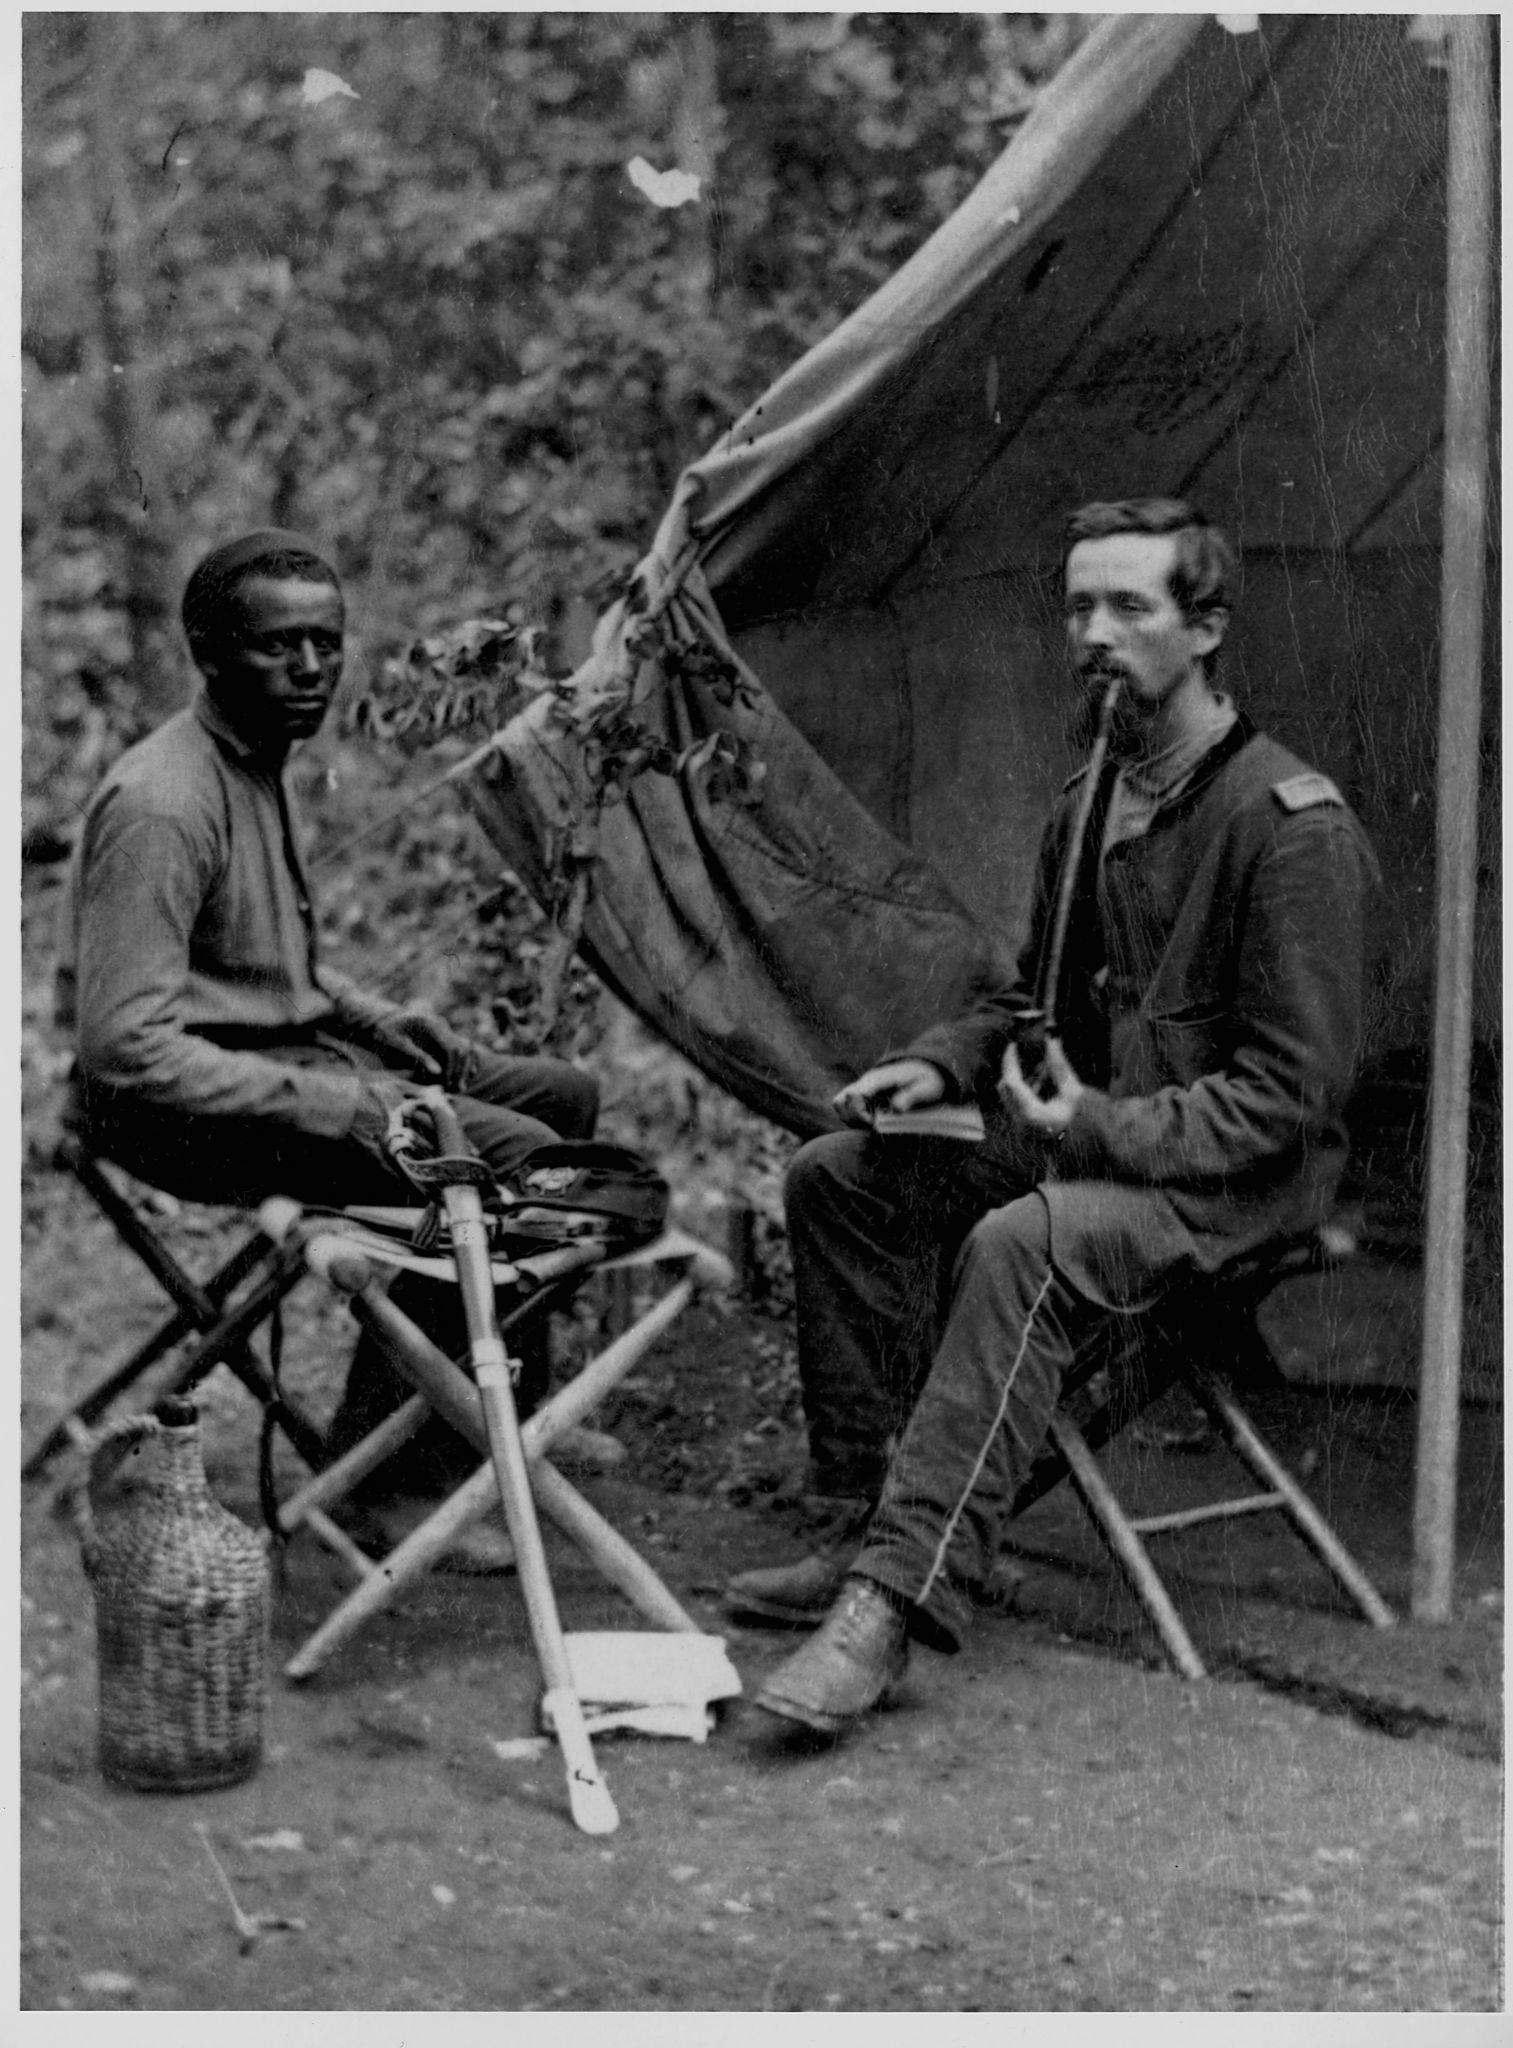 Civil War Photos Show The Bloo St War In U S History